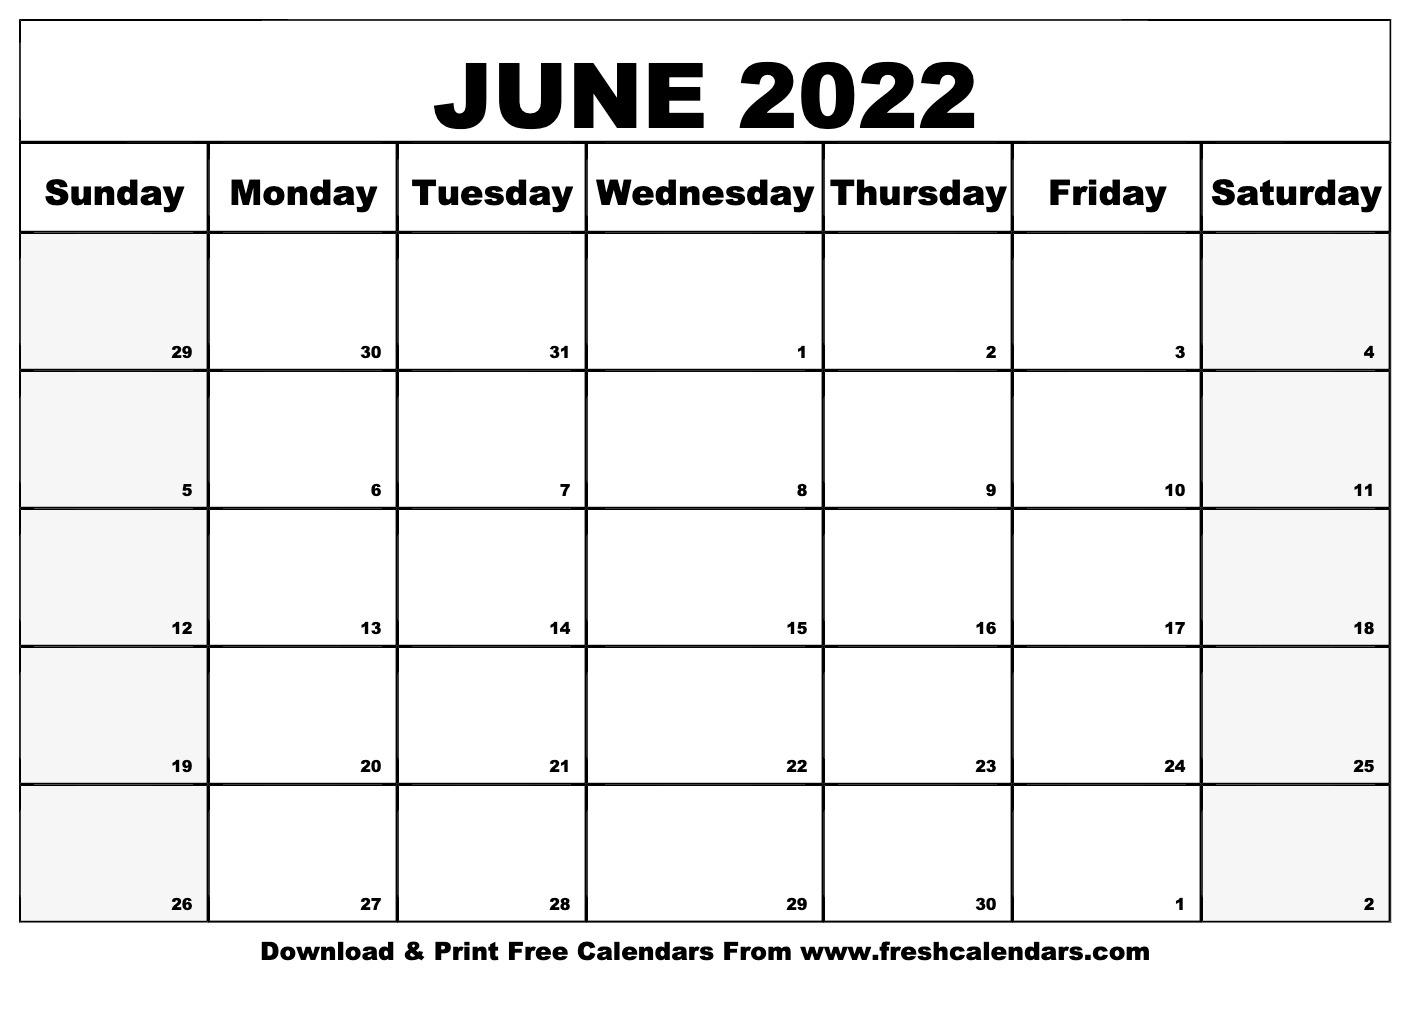 Blank Printable June 2022 Calendars Within March April May June Calendar 2022